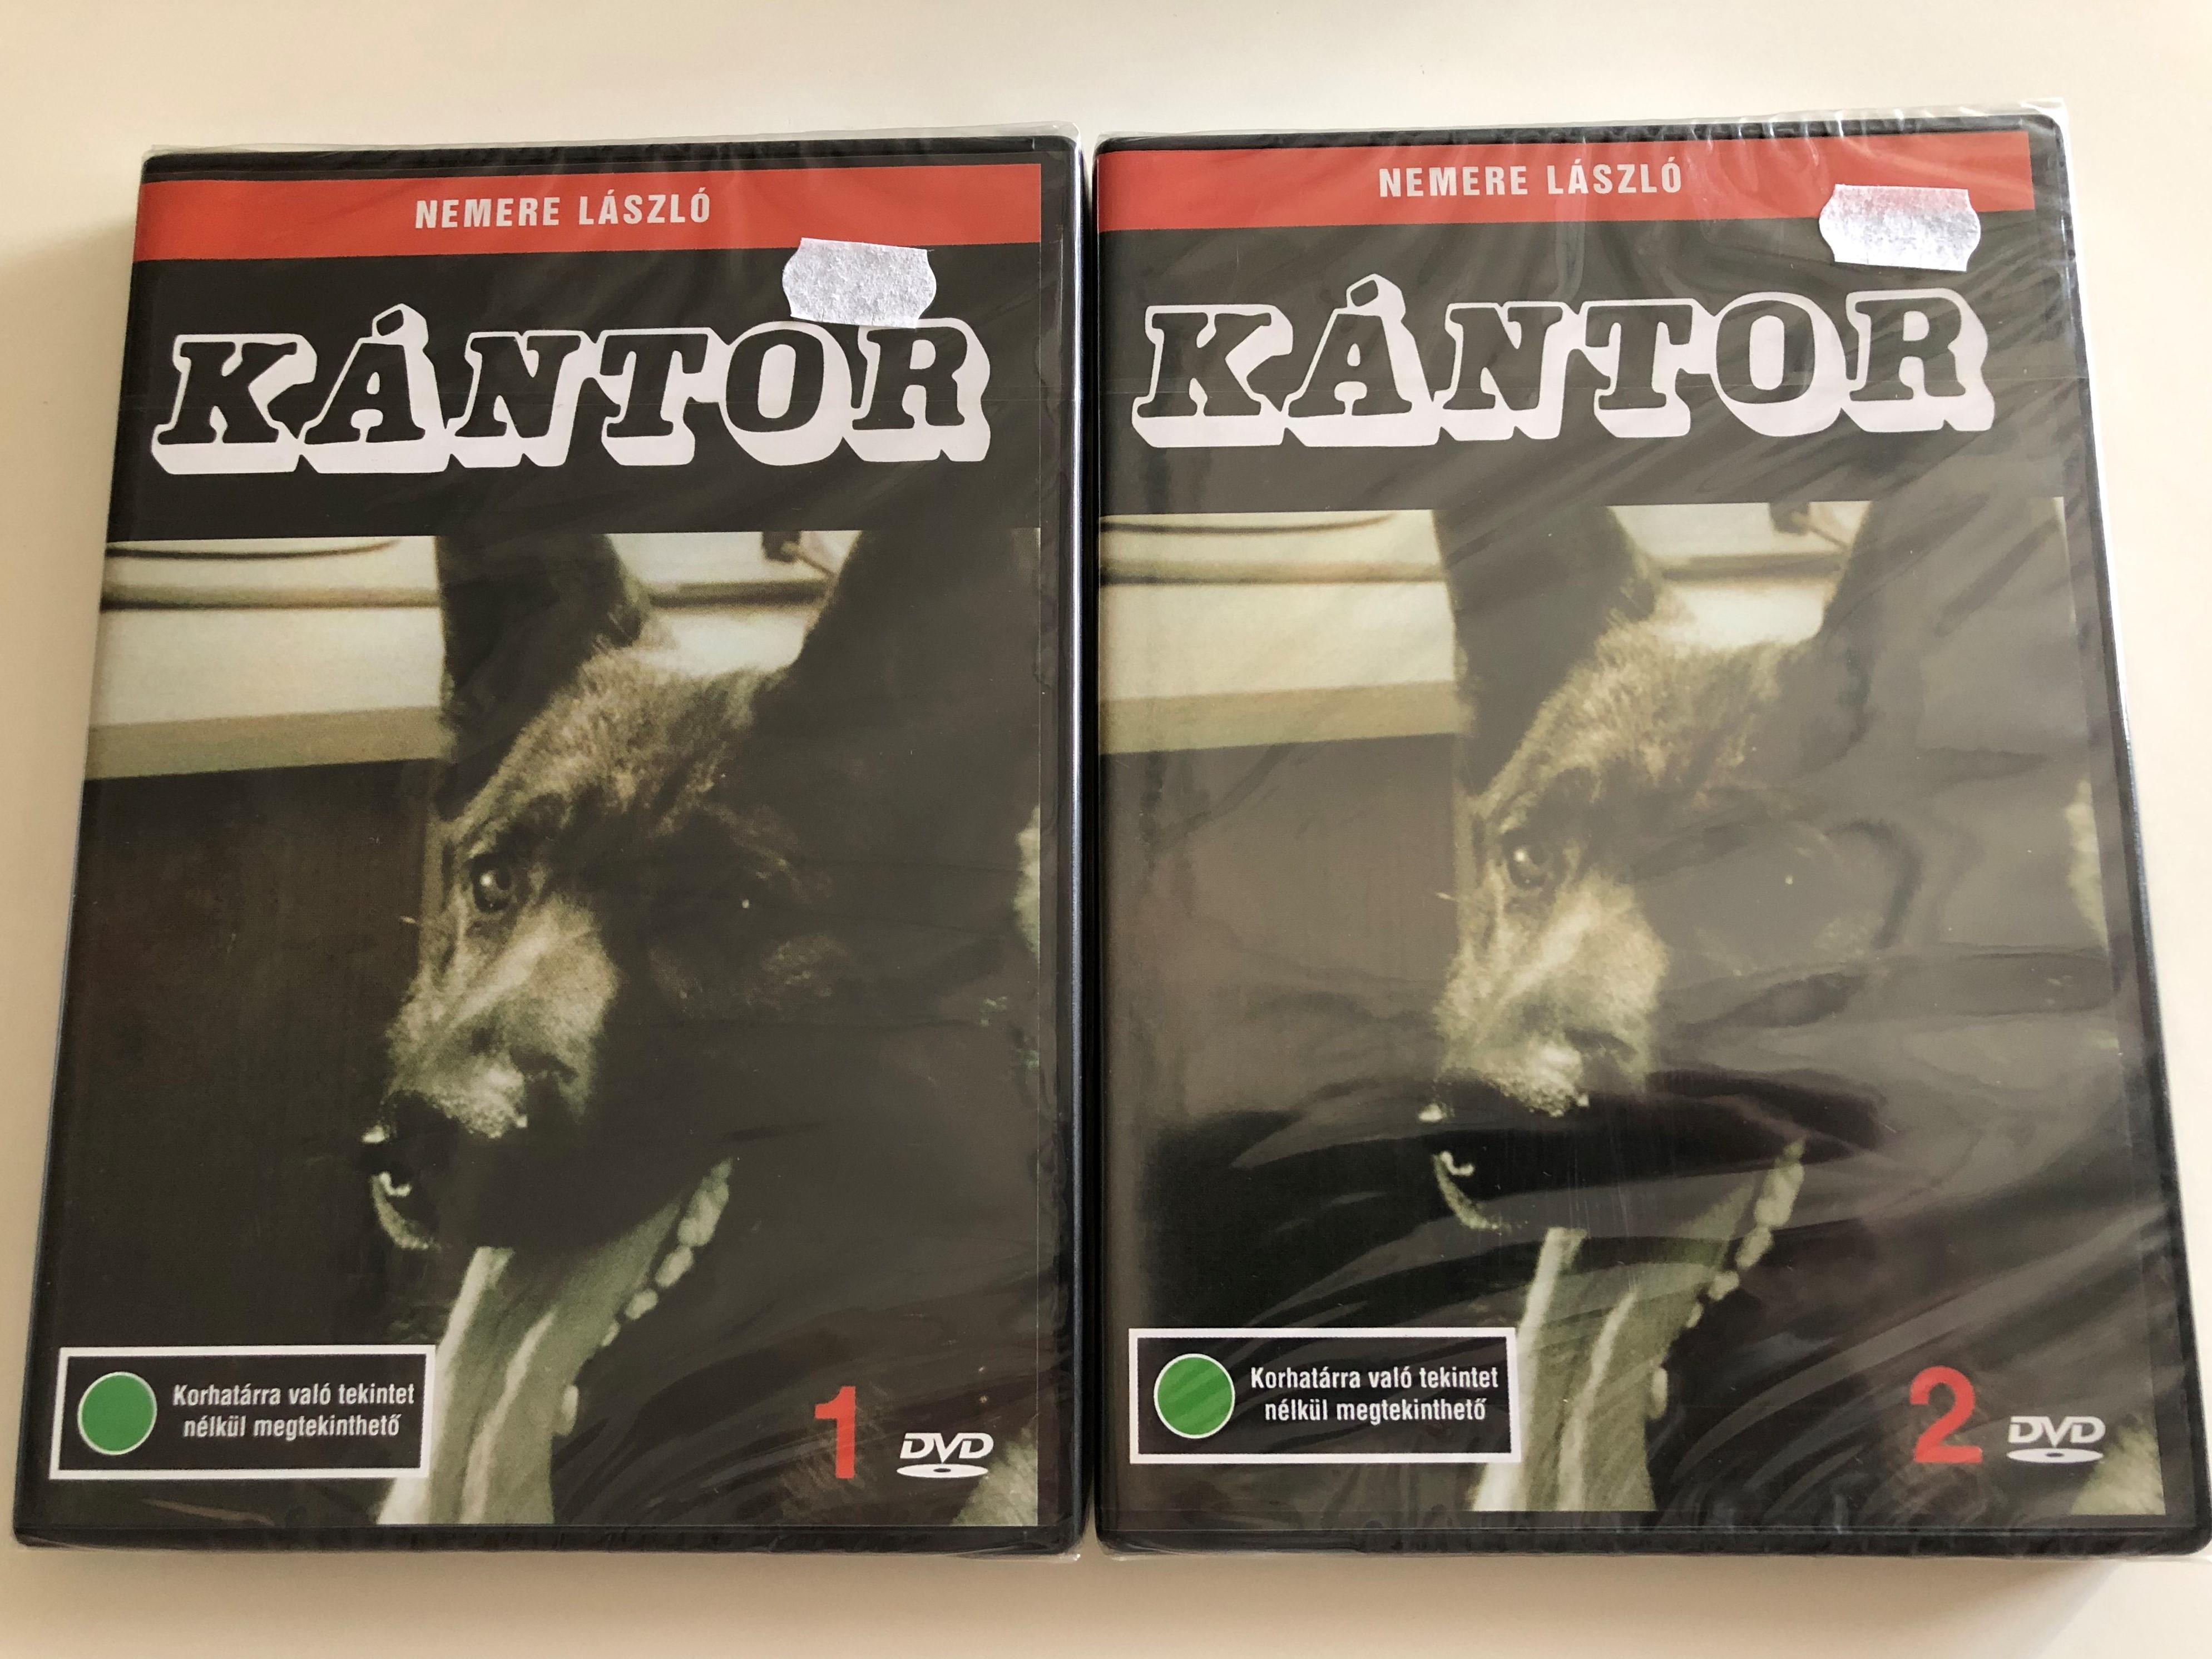 k-ntor-1.-2.-dvd-set-1976-directed-by-nemere-l-szl-1.jpg